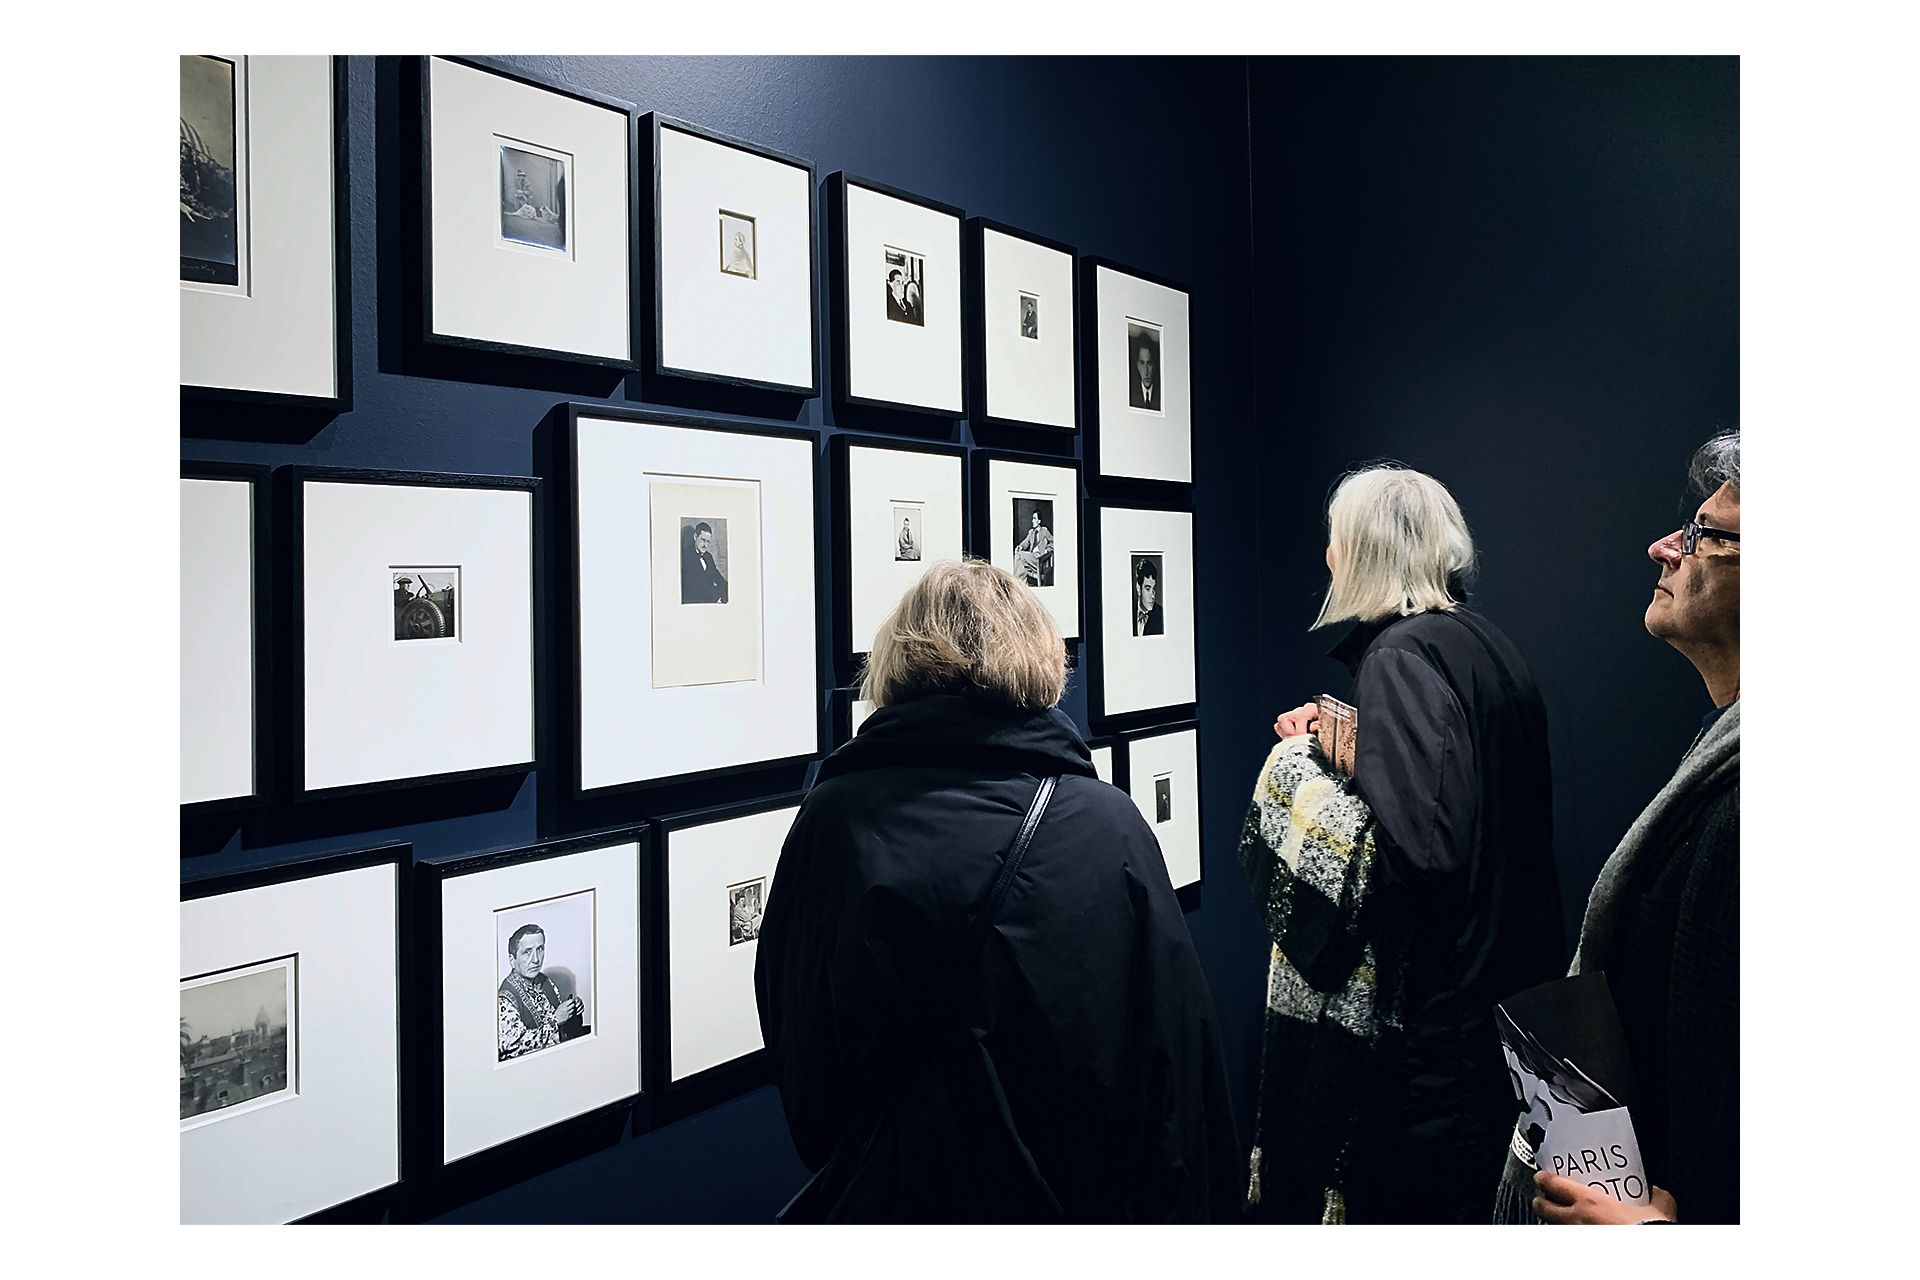 Fotokunstmarkt : Prints direkt verkaufen?!?